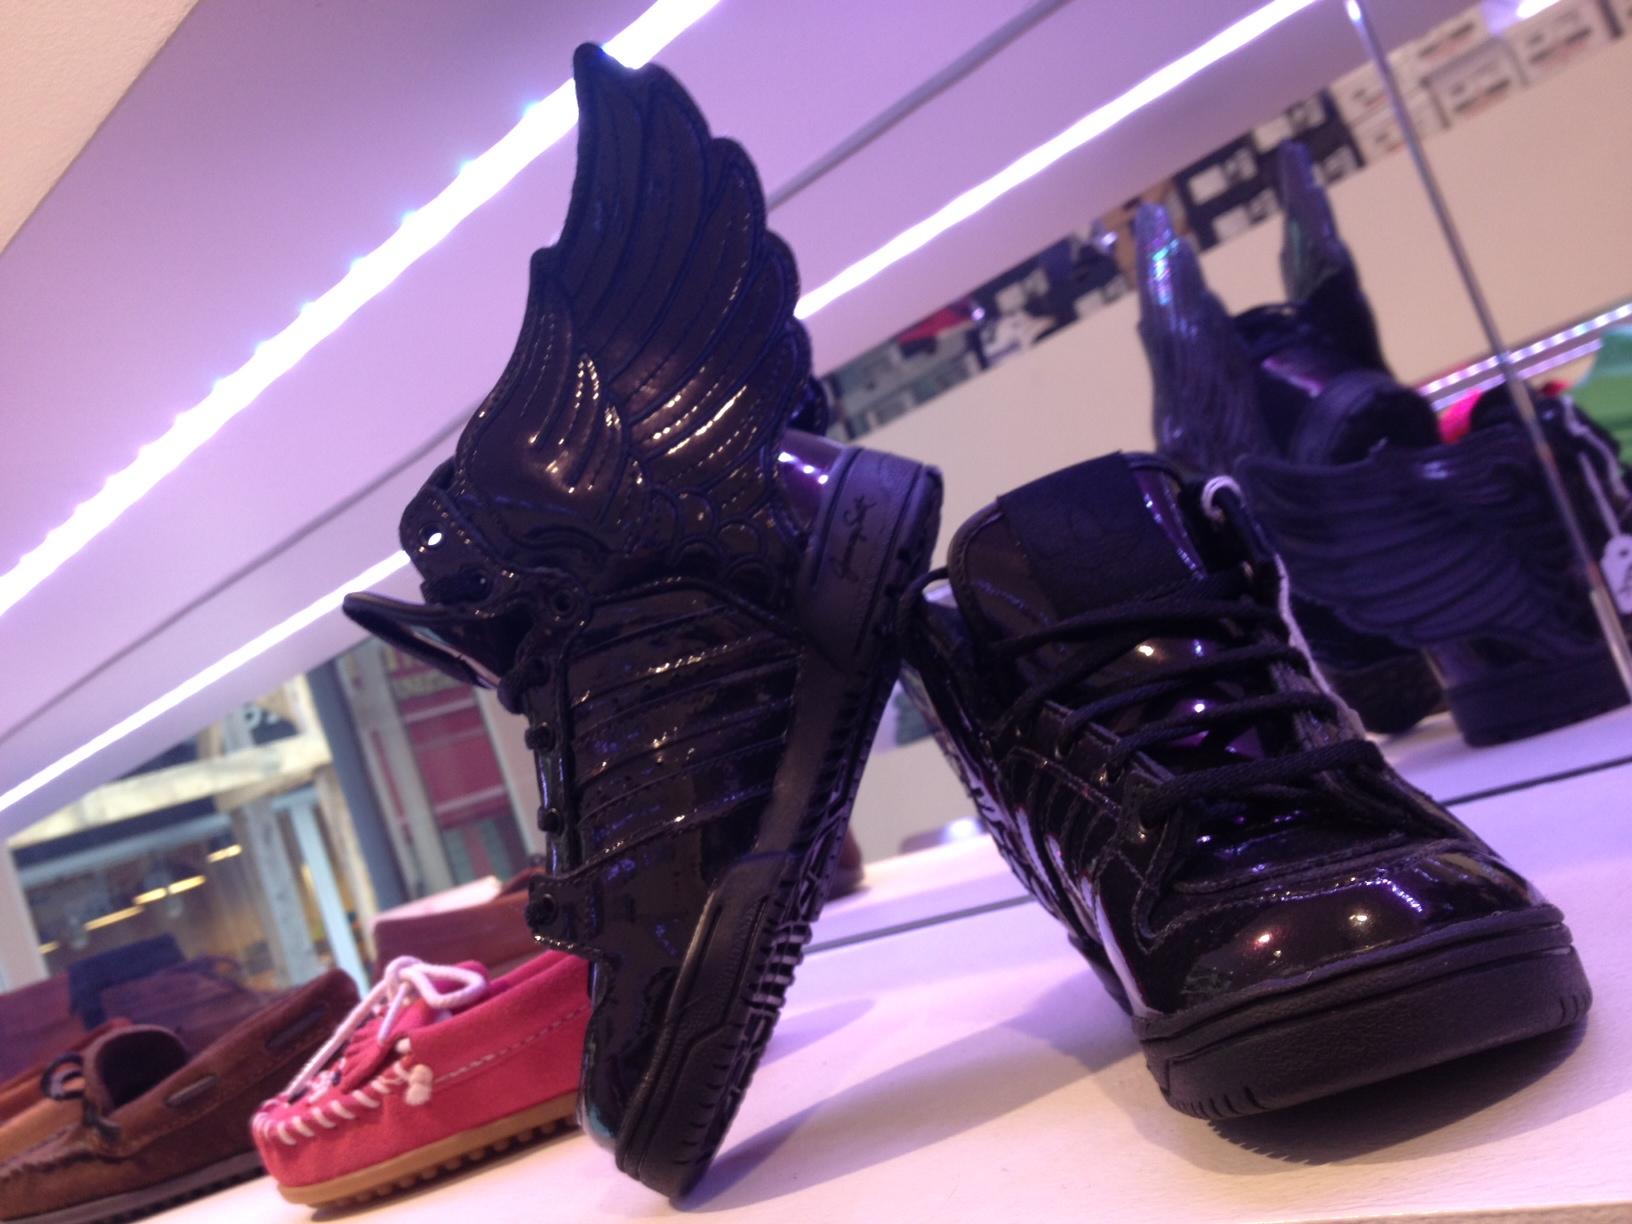 Chaussures Pour Adidas Pour Adidas Chaussures Enfant ZN8nP0XwkO